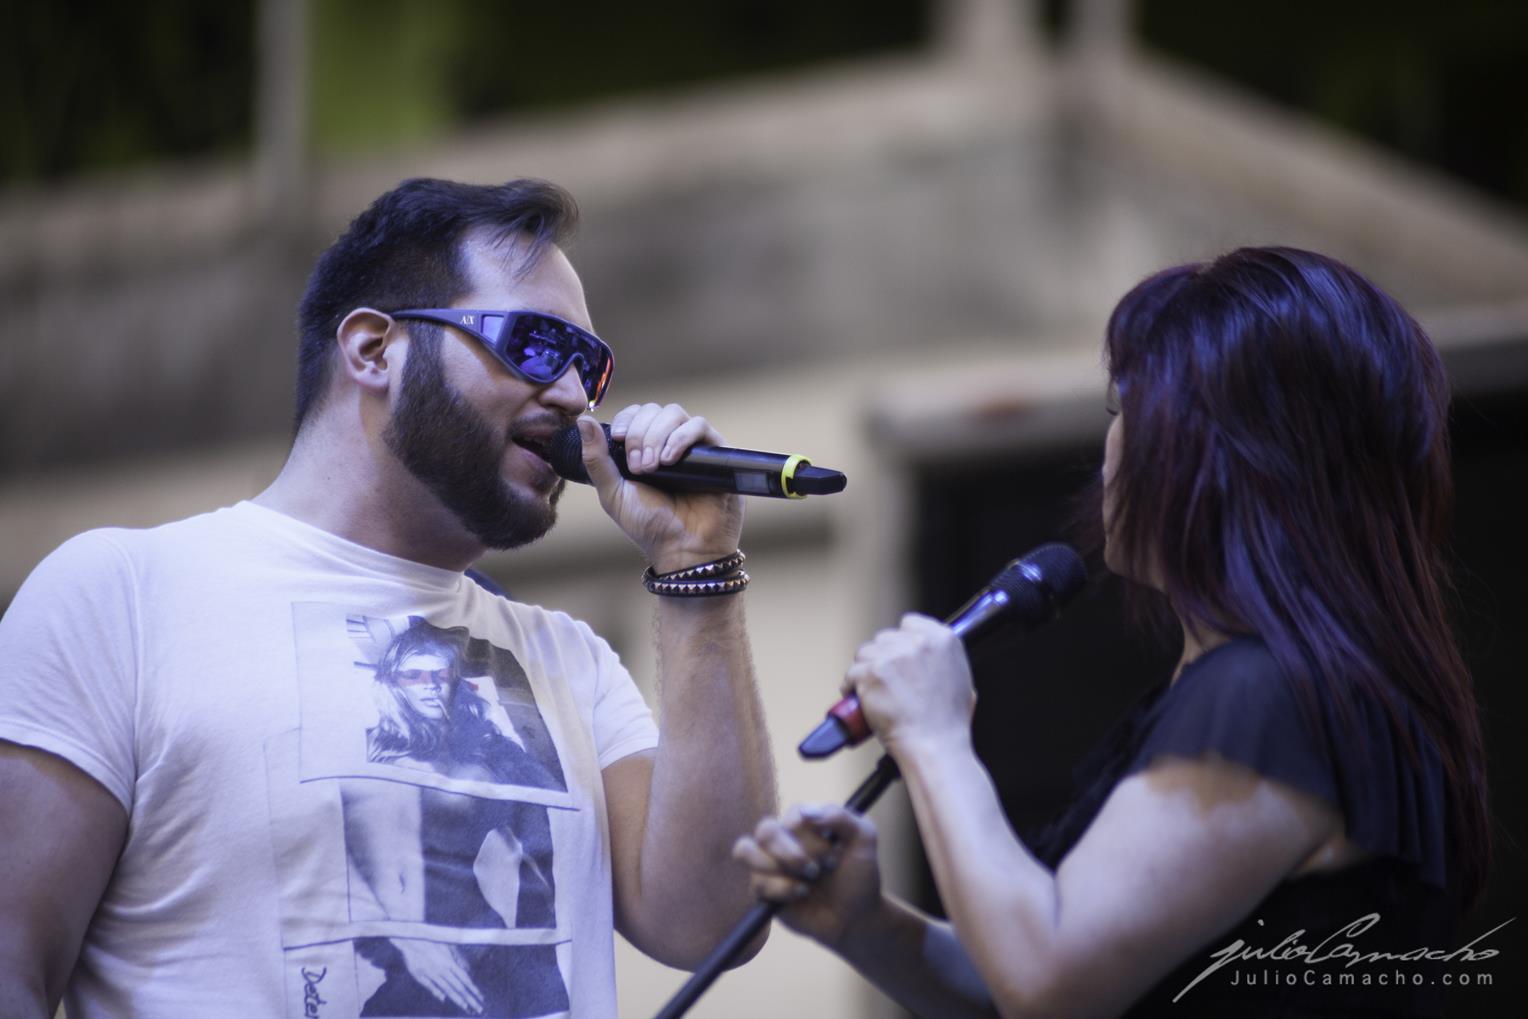 2014-10-30 31 CAST TOUR Ensenada y Tijuana - 1304 - www.Juli (Copy).jpg